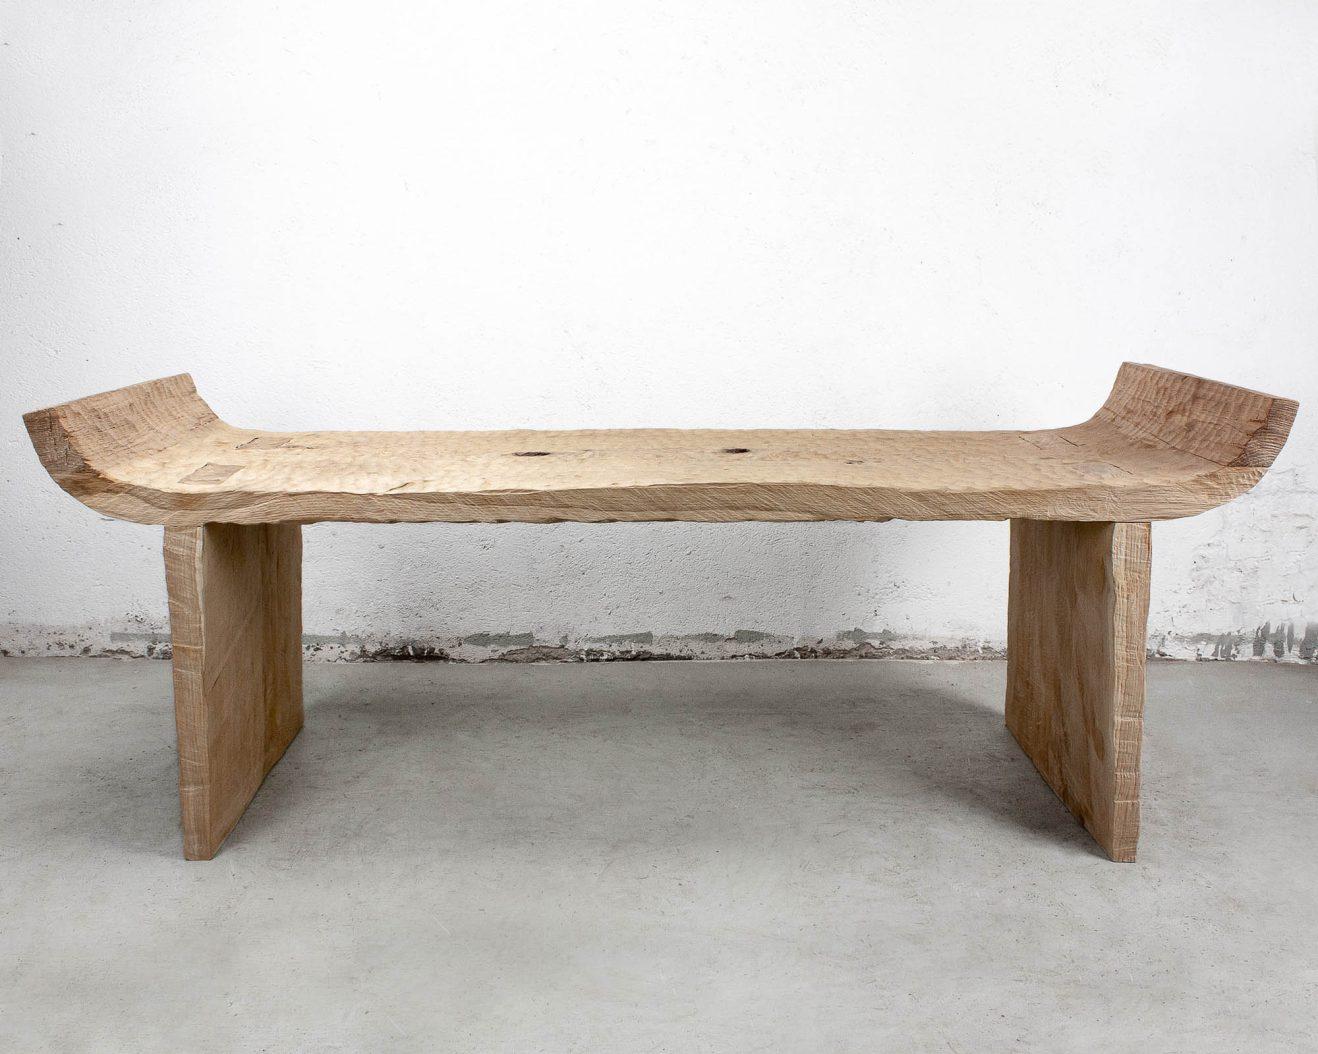 Soha-Bench-Antique-Light-2